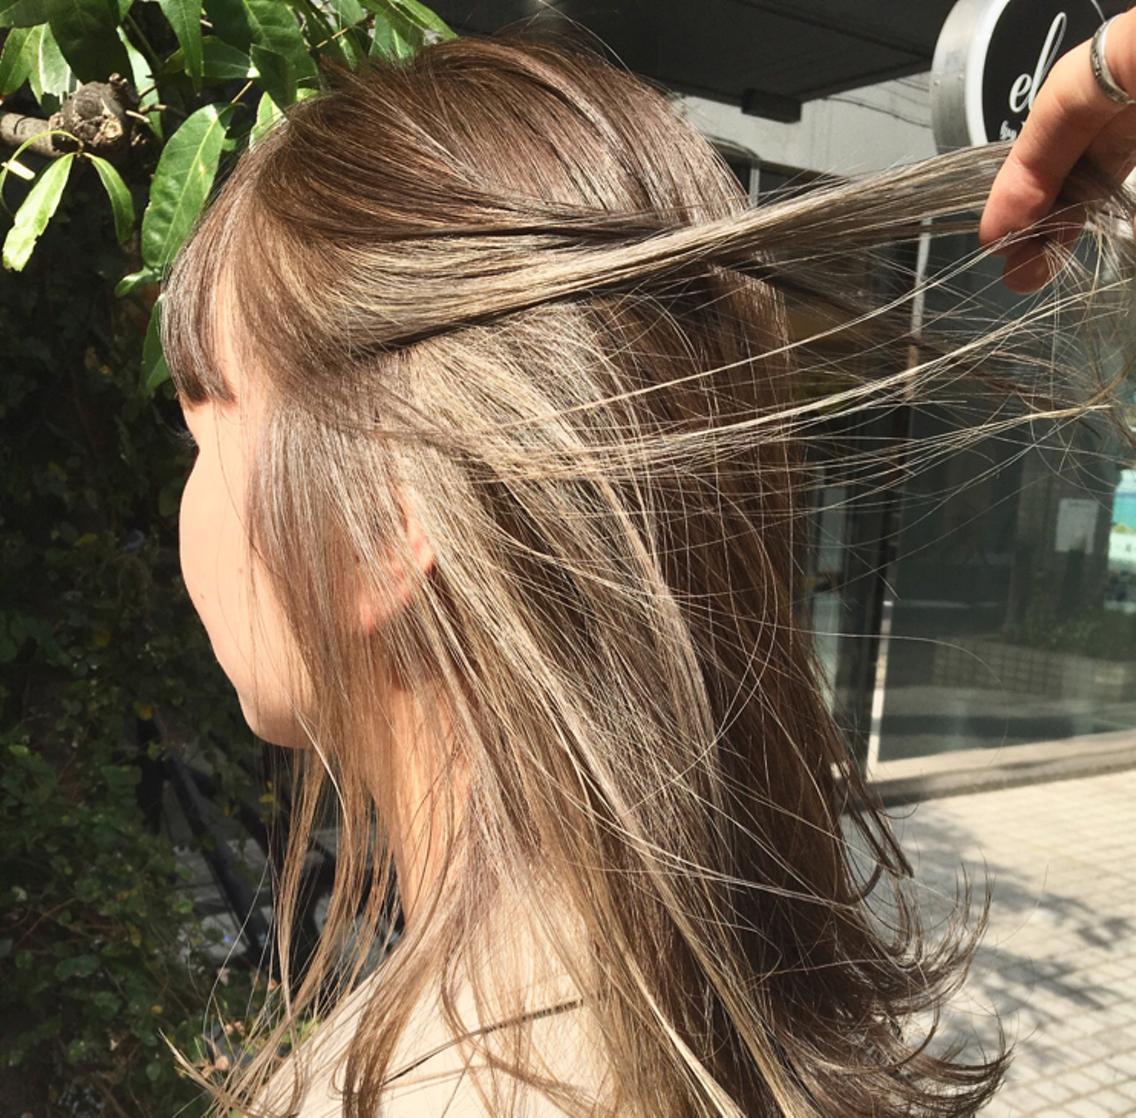 ☀︎昼間ご予約OK☀︎【限定】ショートヘア&ボブカット大募集‼︎夏に向けて新しい可愛いを✨